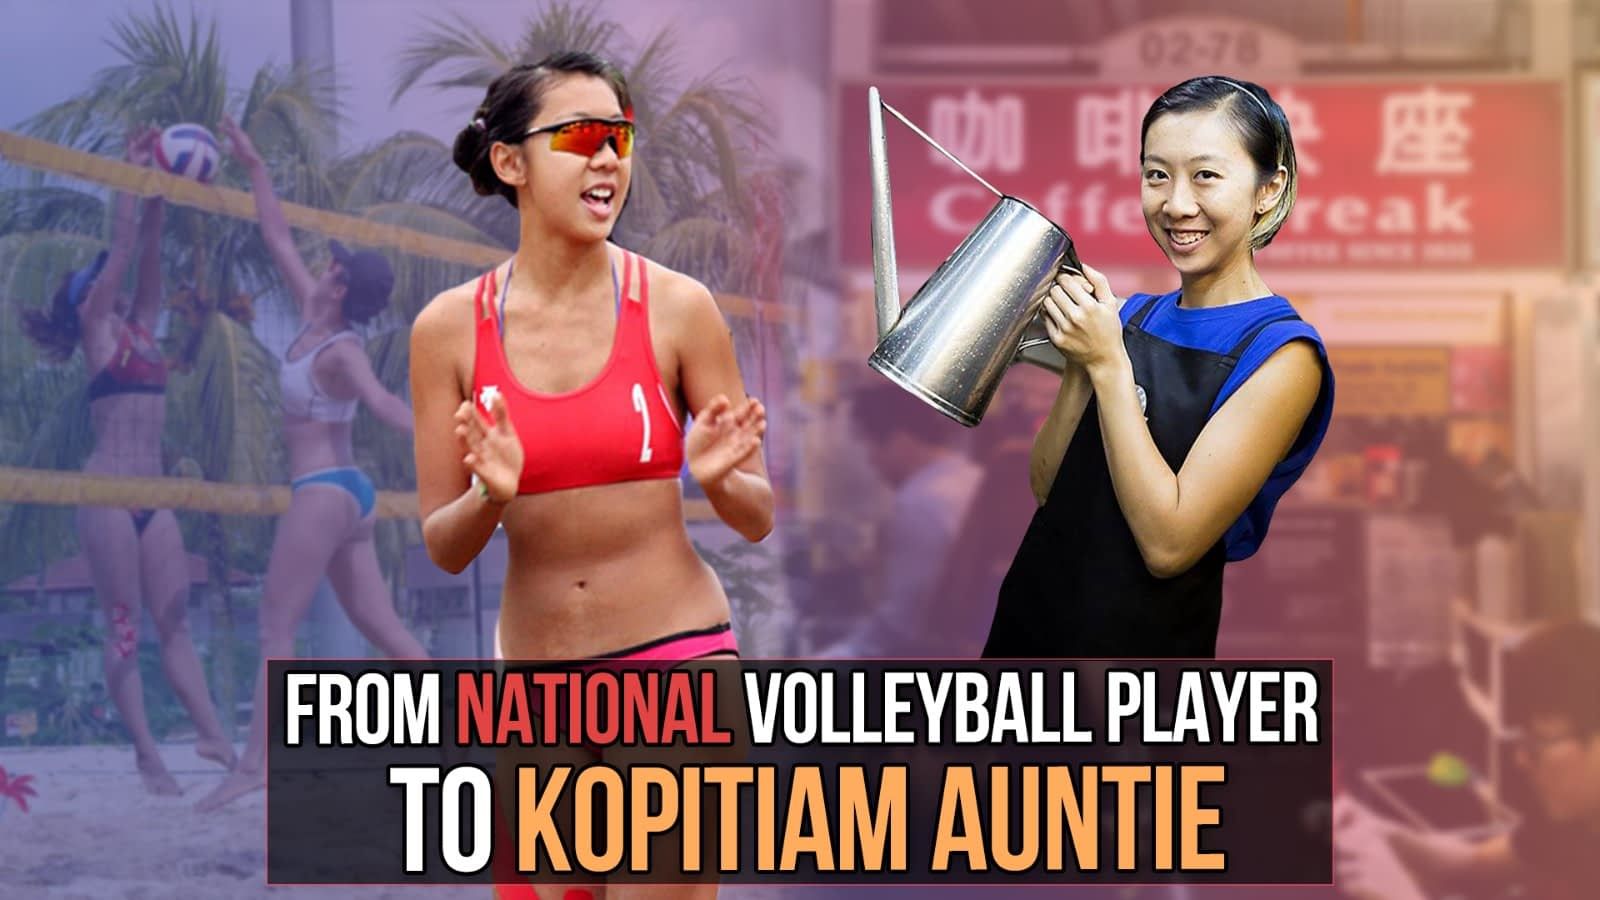 National Volleyball player to Kopitiam Auntie